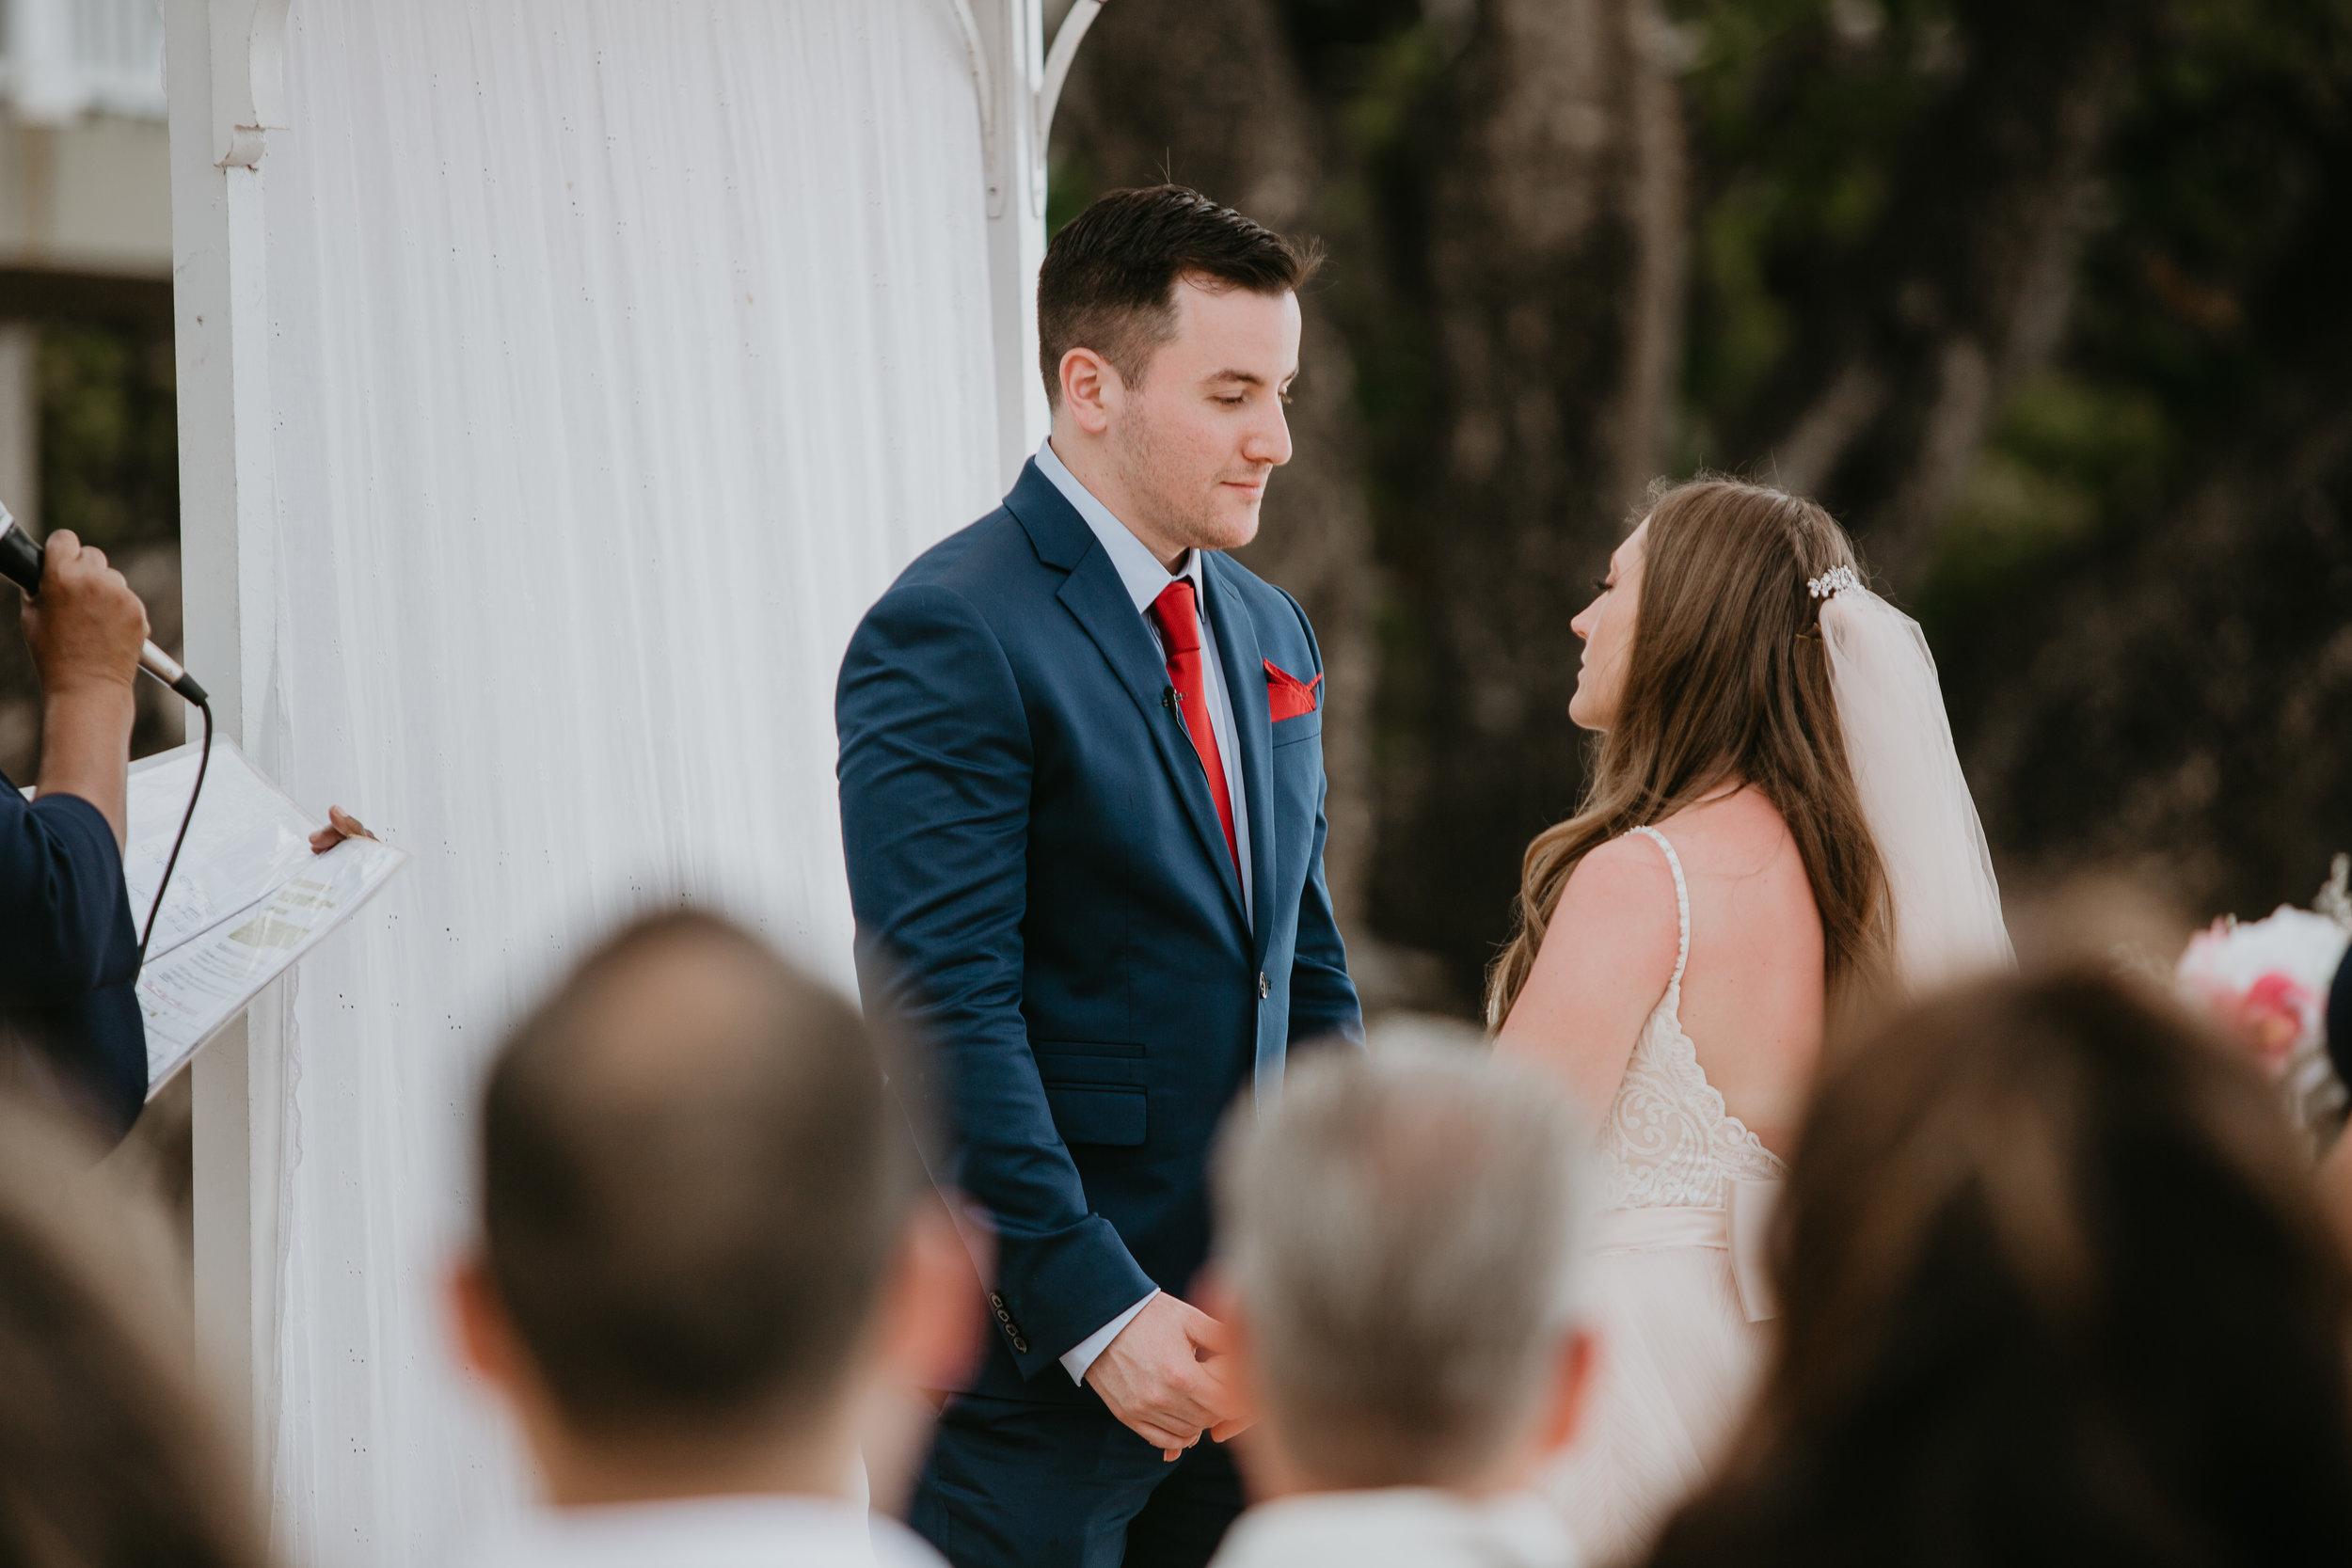 nicole-daacke-photography-destination-wedding-in-st-lucia-sandals-la-toc-intimate-island-wedding-carribean-elopement-photographer-chill-island-wedding-63.jpg